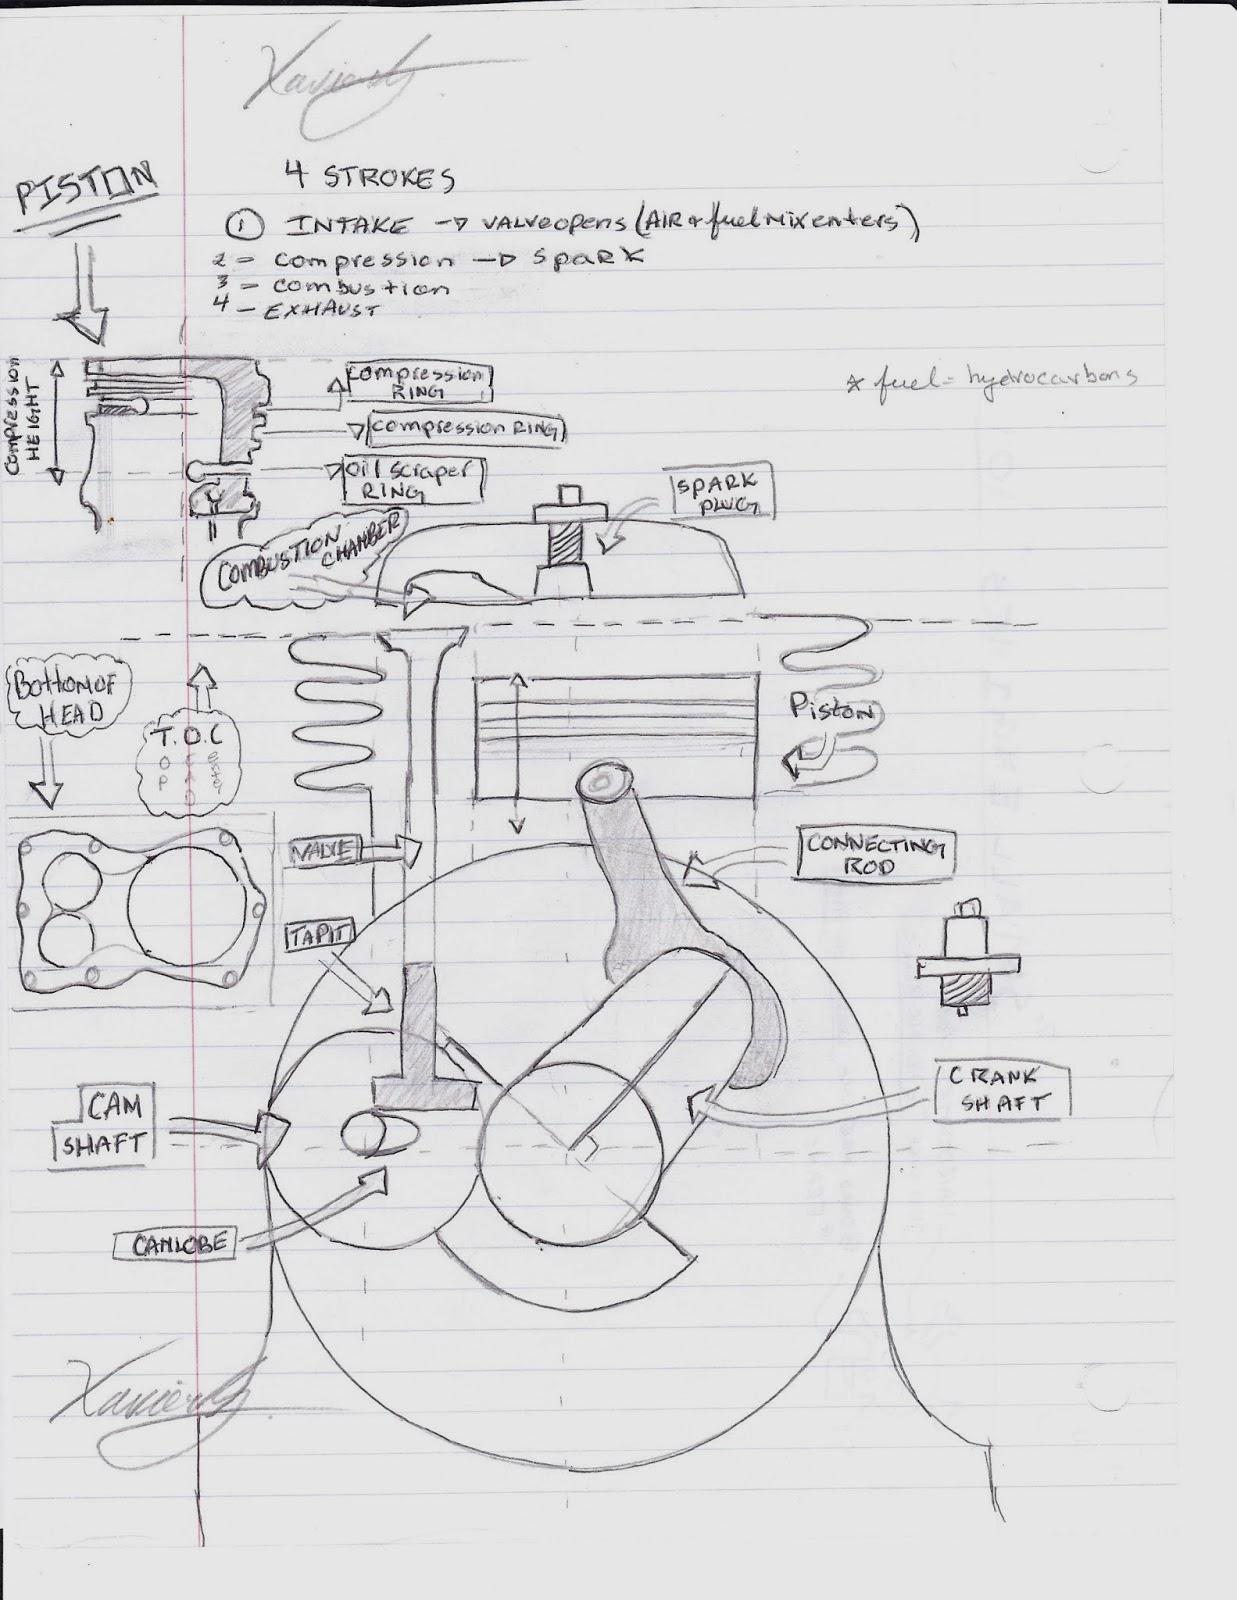 engine diagram drawn small engine 101 [ 1237 x 1600 Pixel ]